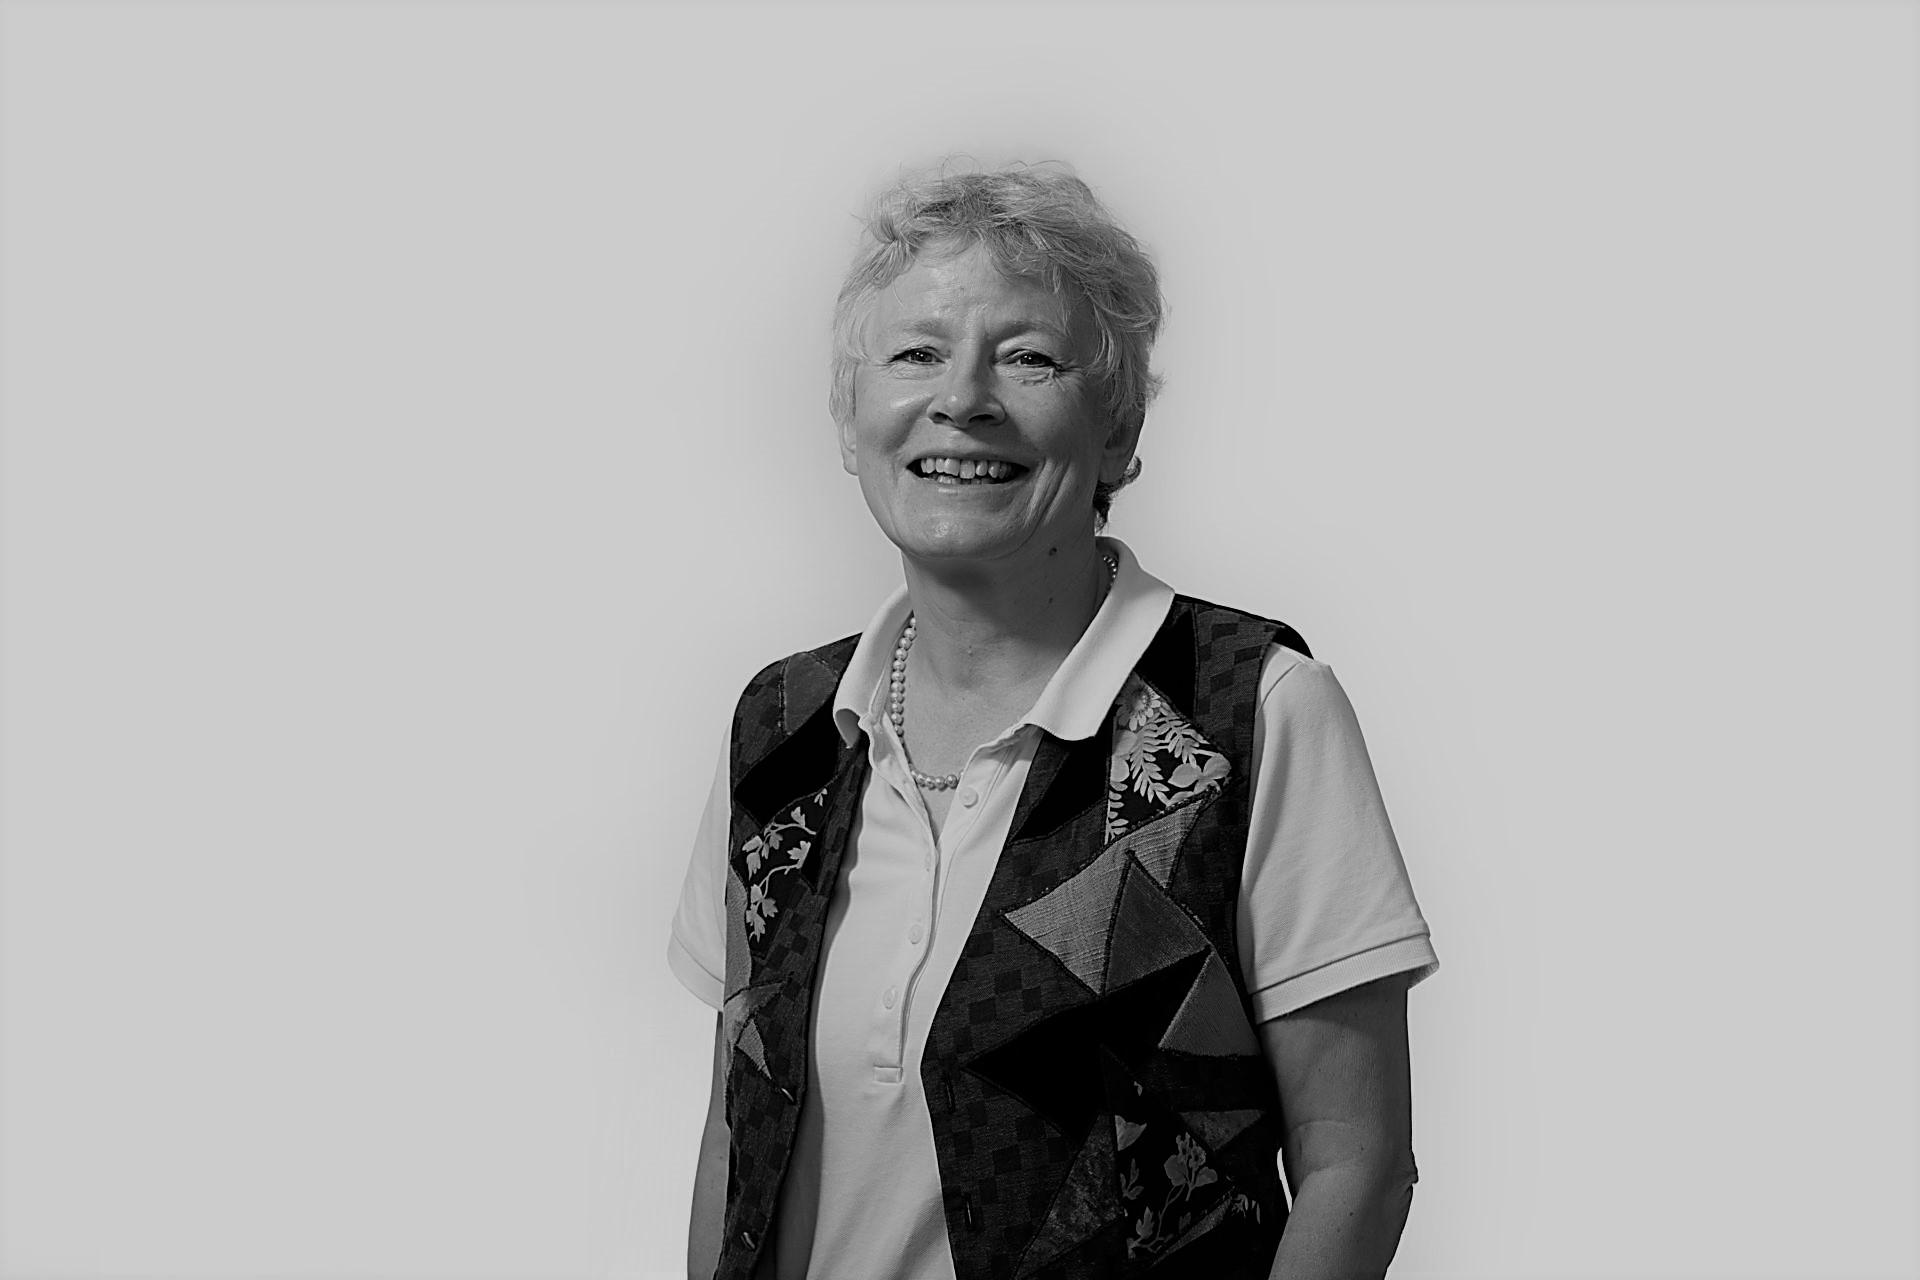 Photo of Isobel Mills, CBE